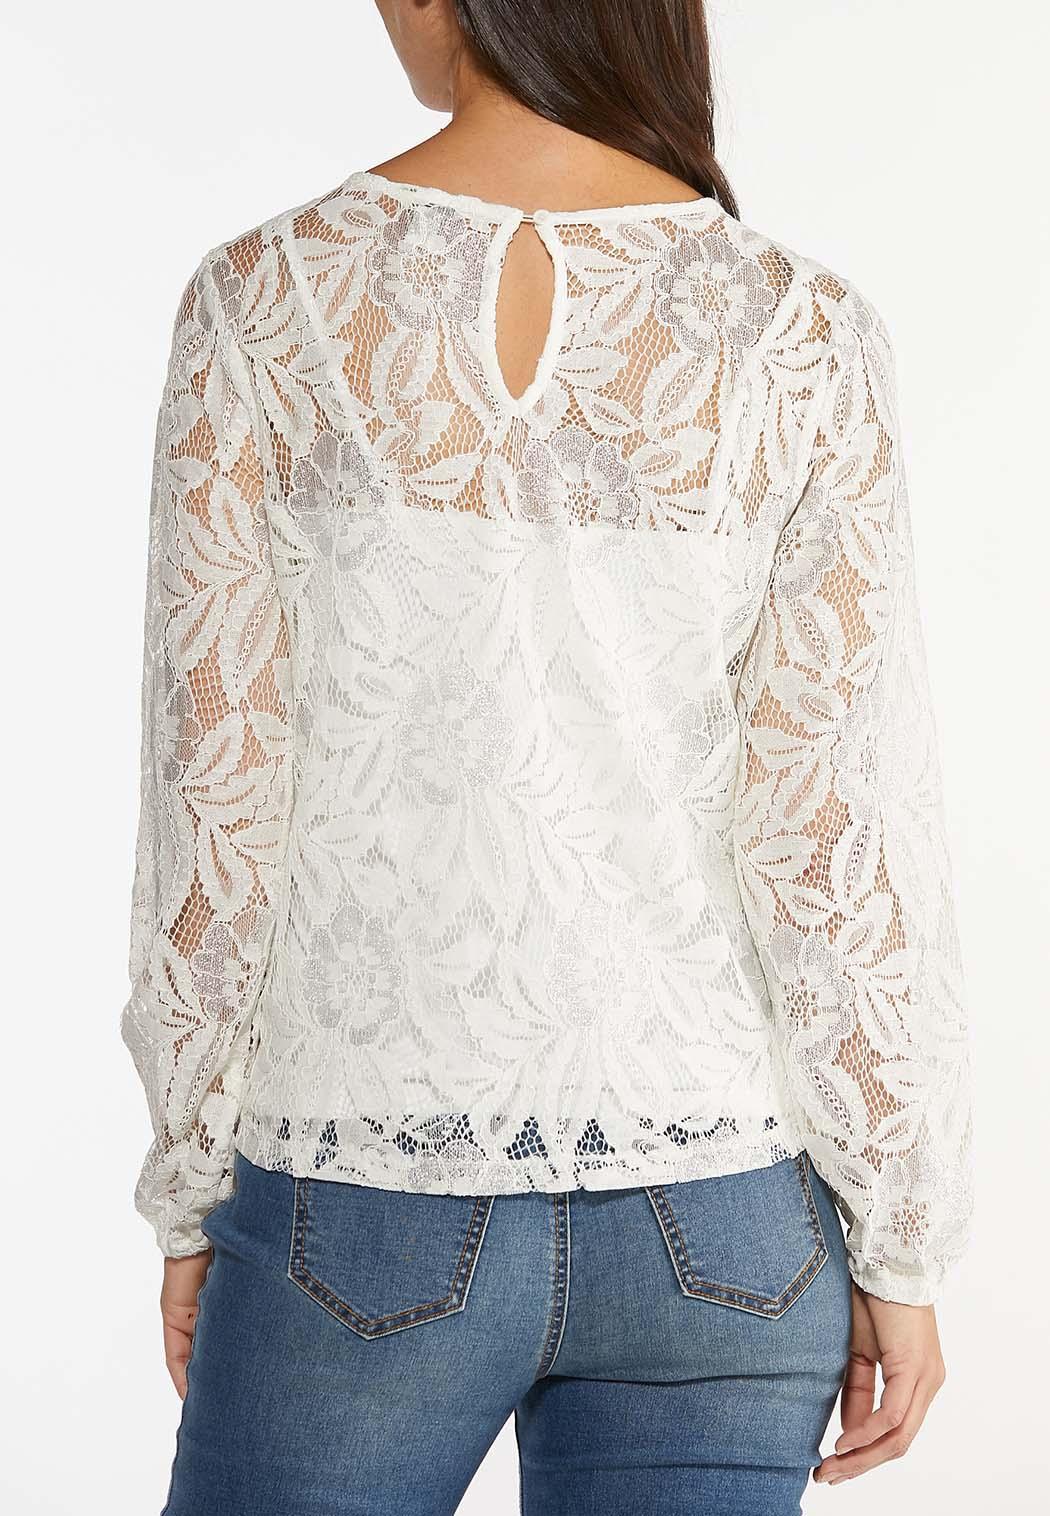 Metallic Lace Top (Item #44445126)